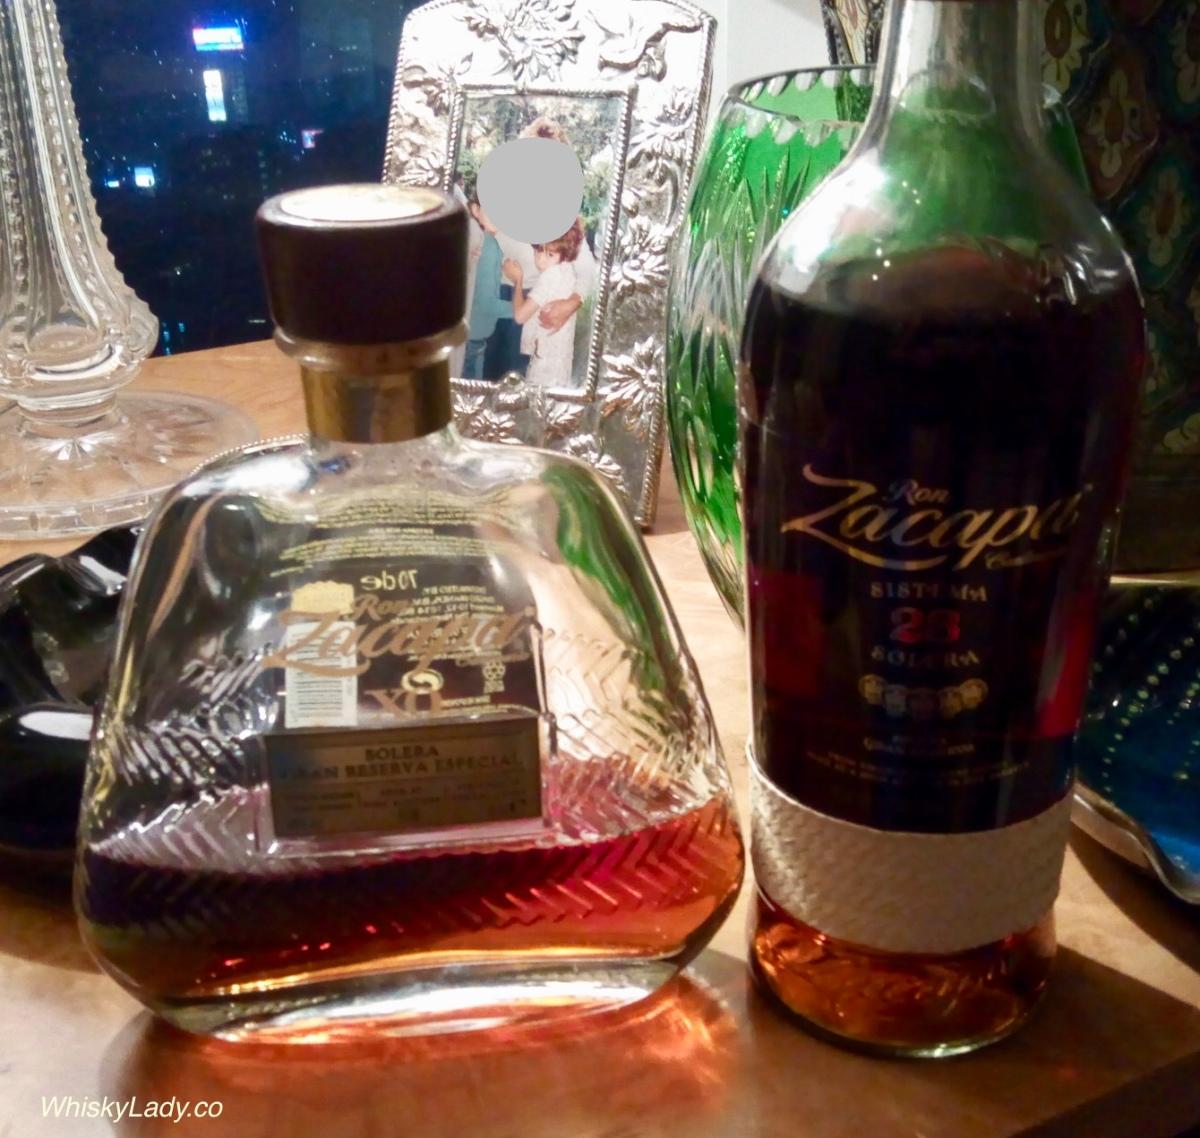 Guatemalan Rum - Zacapa 23 Solero 40% vs XO 40%